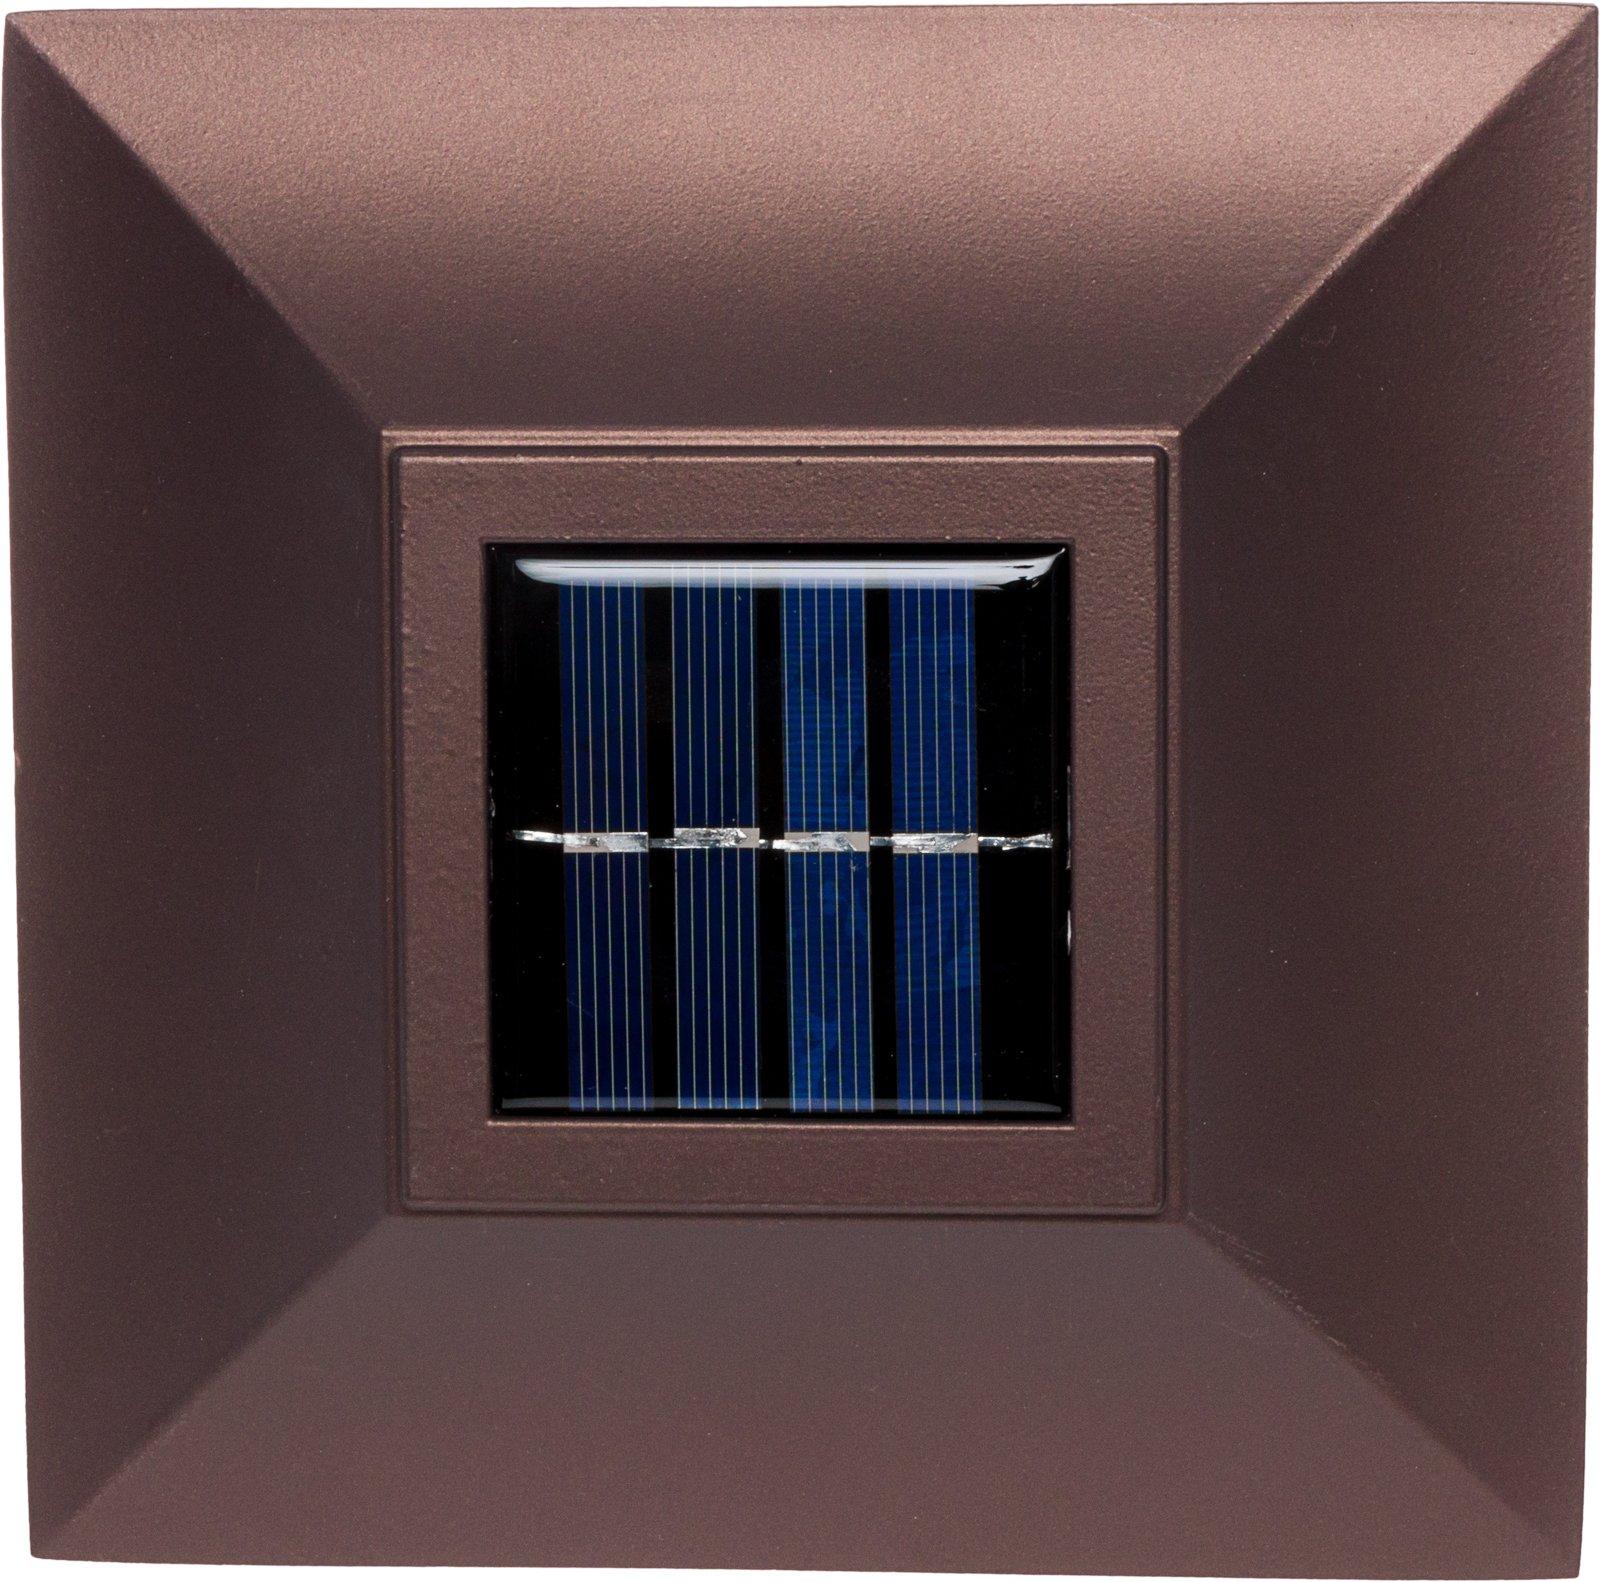 GreenLighting Bronze Aluminum Solar Post Cap Light 4x4 Wood & 6x6 PVC (2 Pack) by GreenLighting (Image #6)